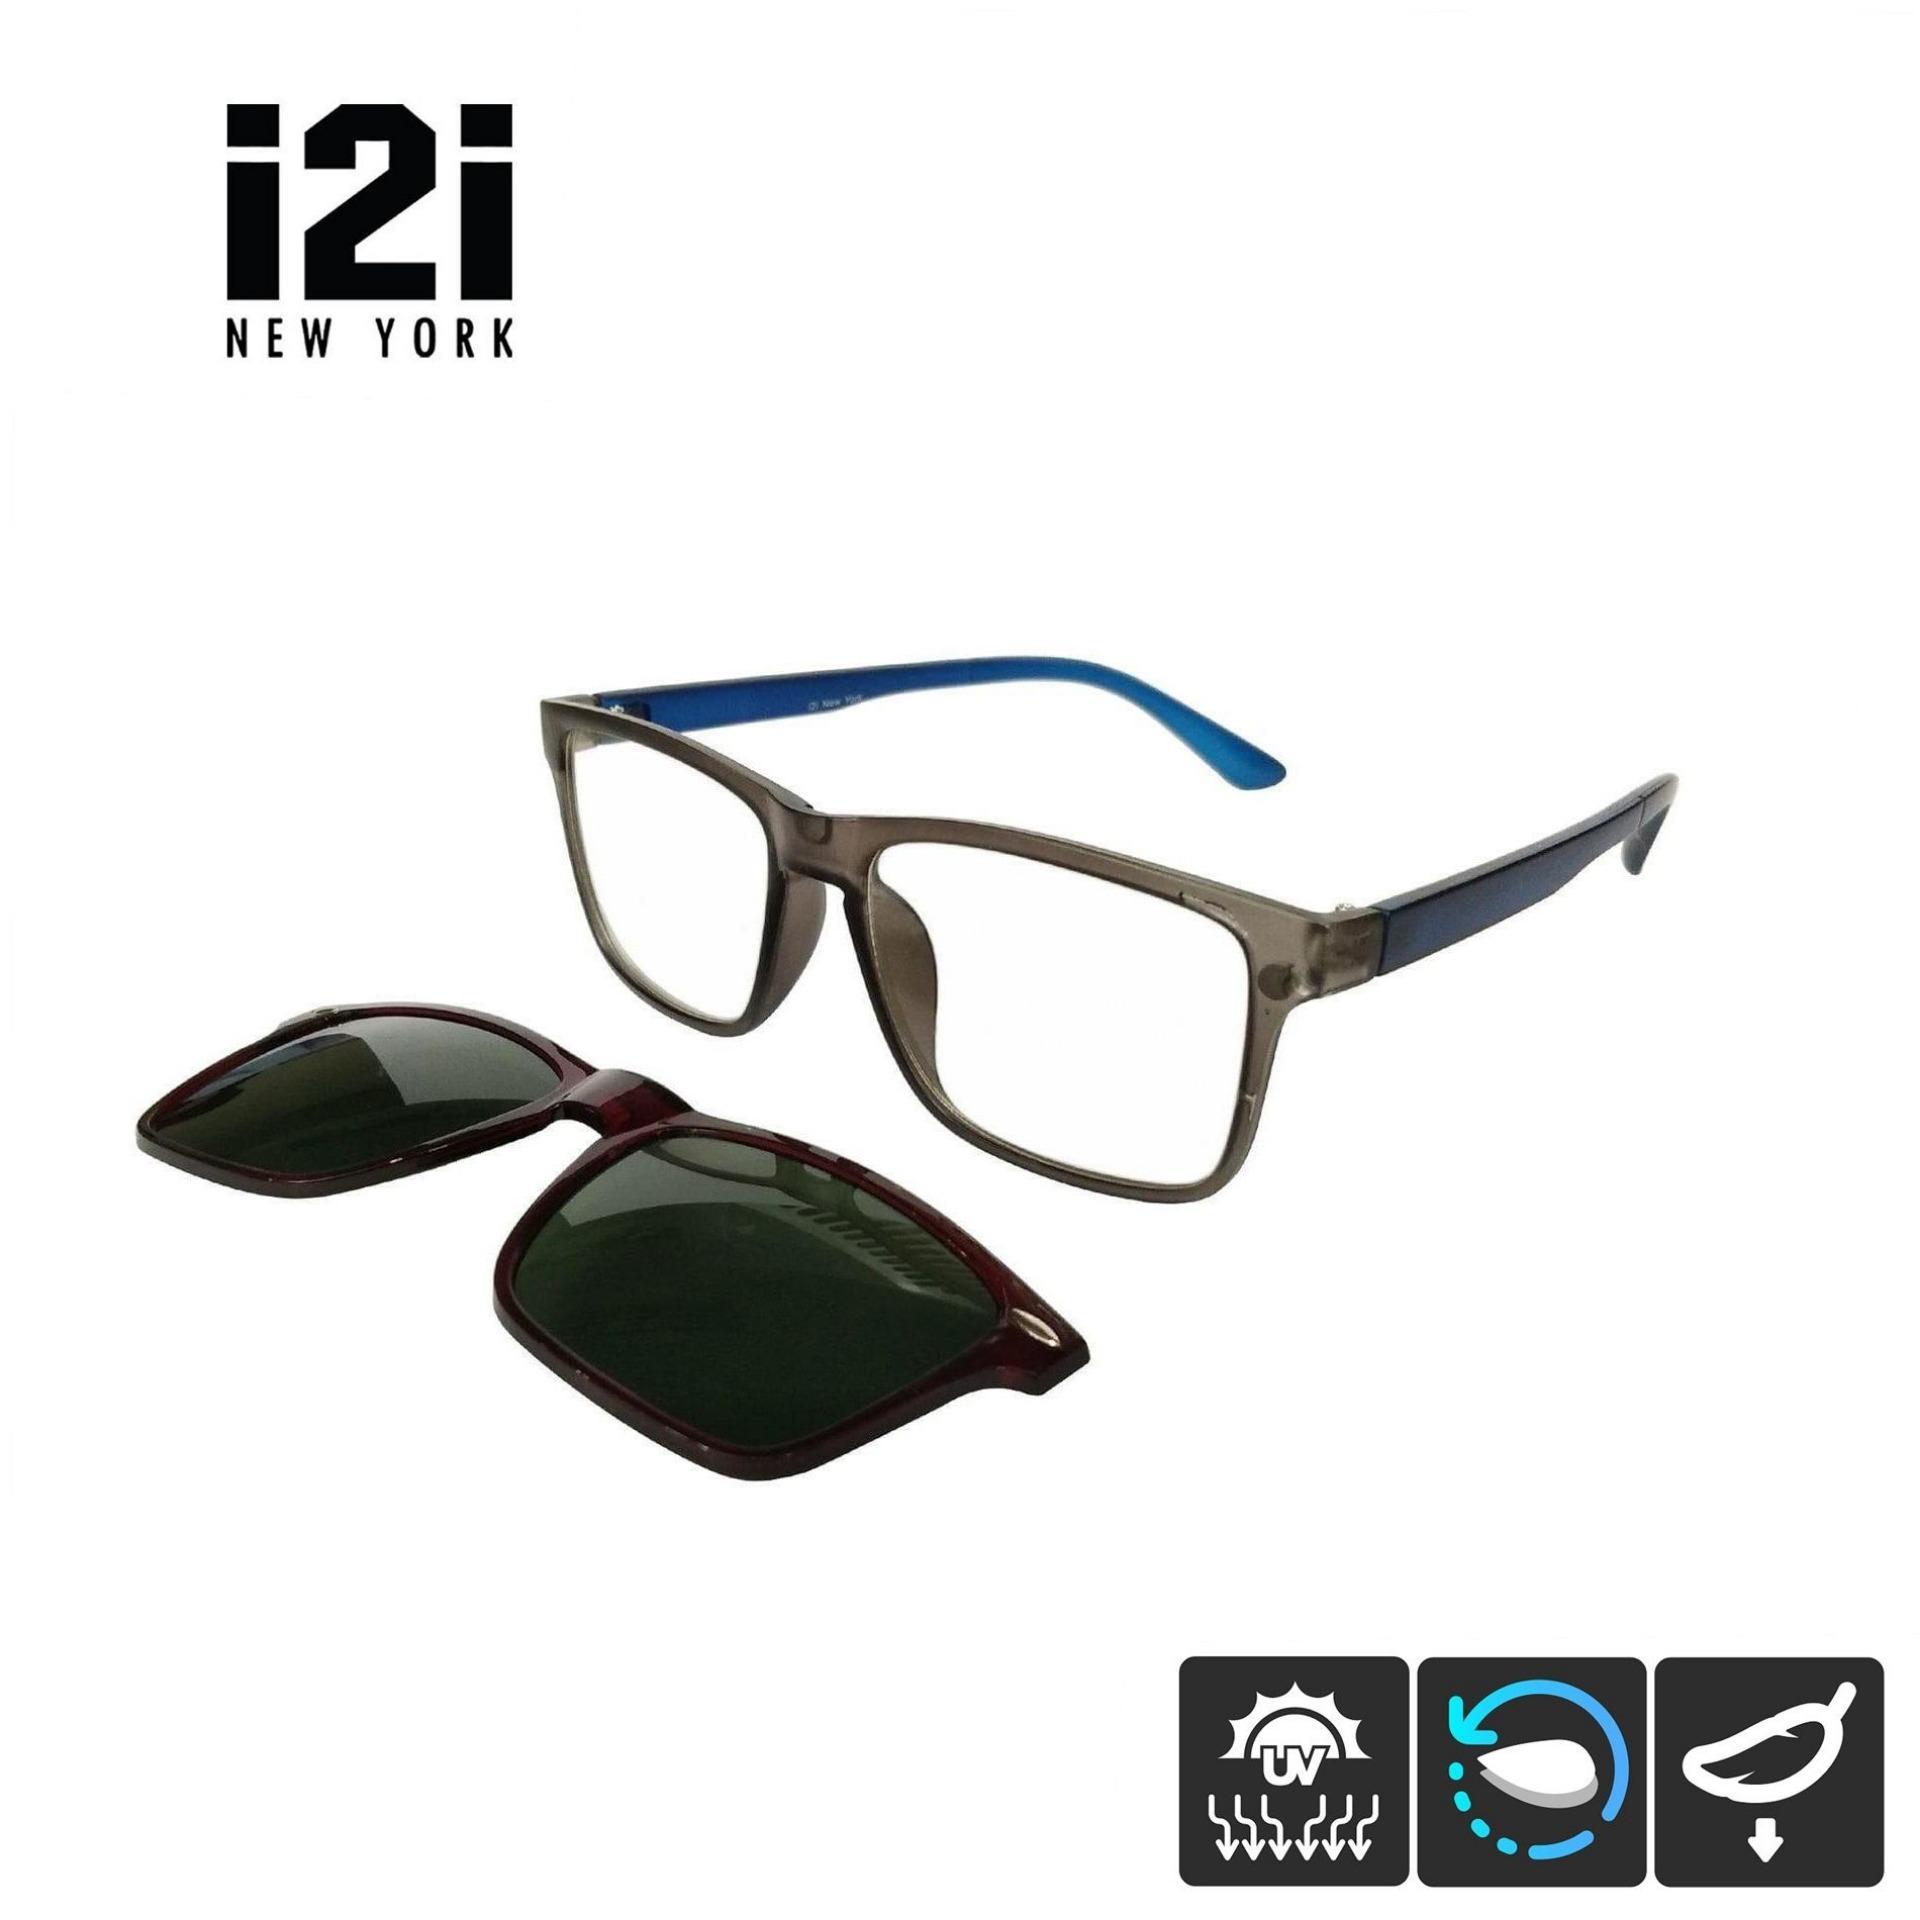 11817870a4 i2i New York Burton 2 399 Magnetic Clip On Eyeglasses (Matte   Clear Grey)